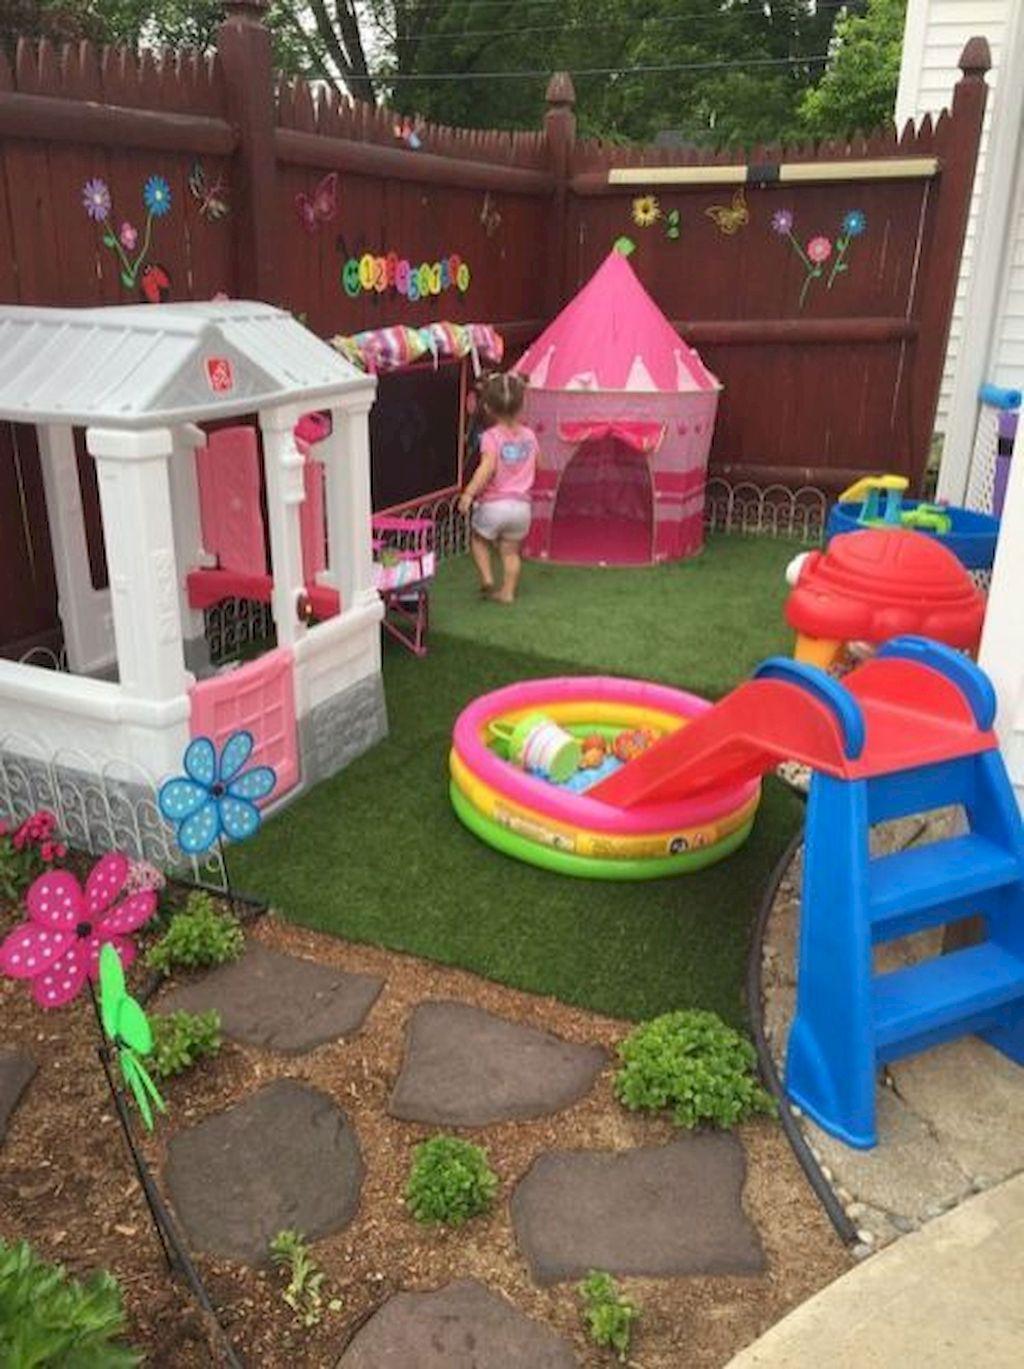 60 Exciting Small Backyard Playground Kids Design Ideas Insidexterior Backyard Kids Play Area Backyard Play Kids Play Area